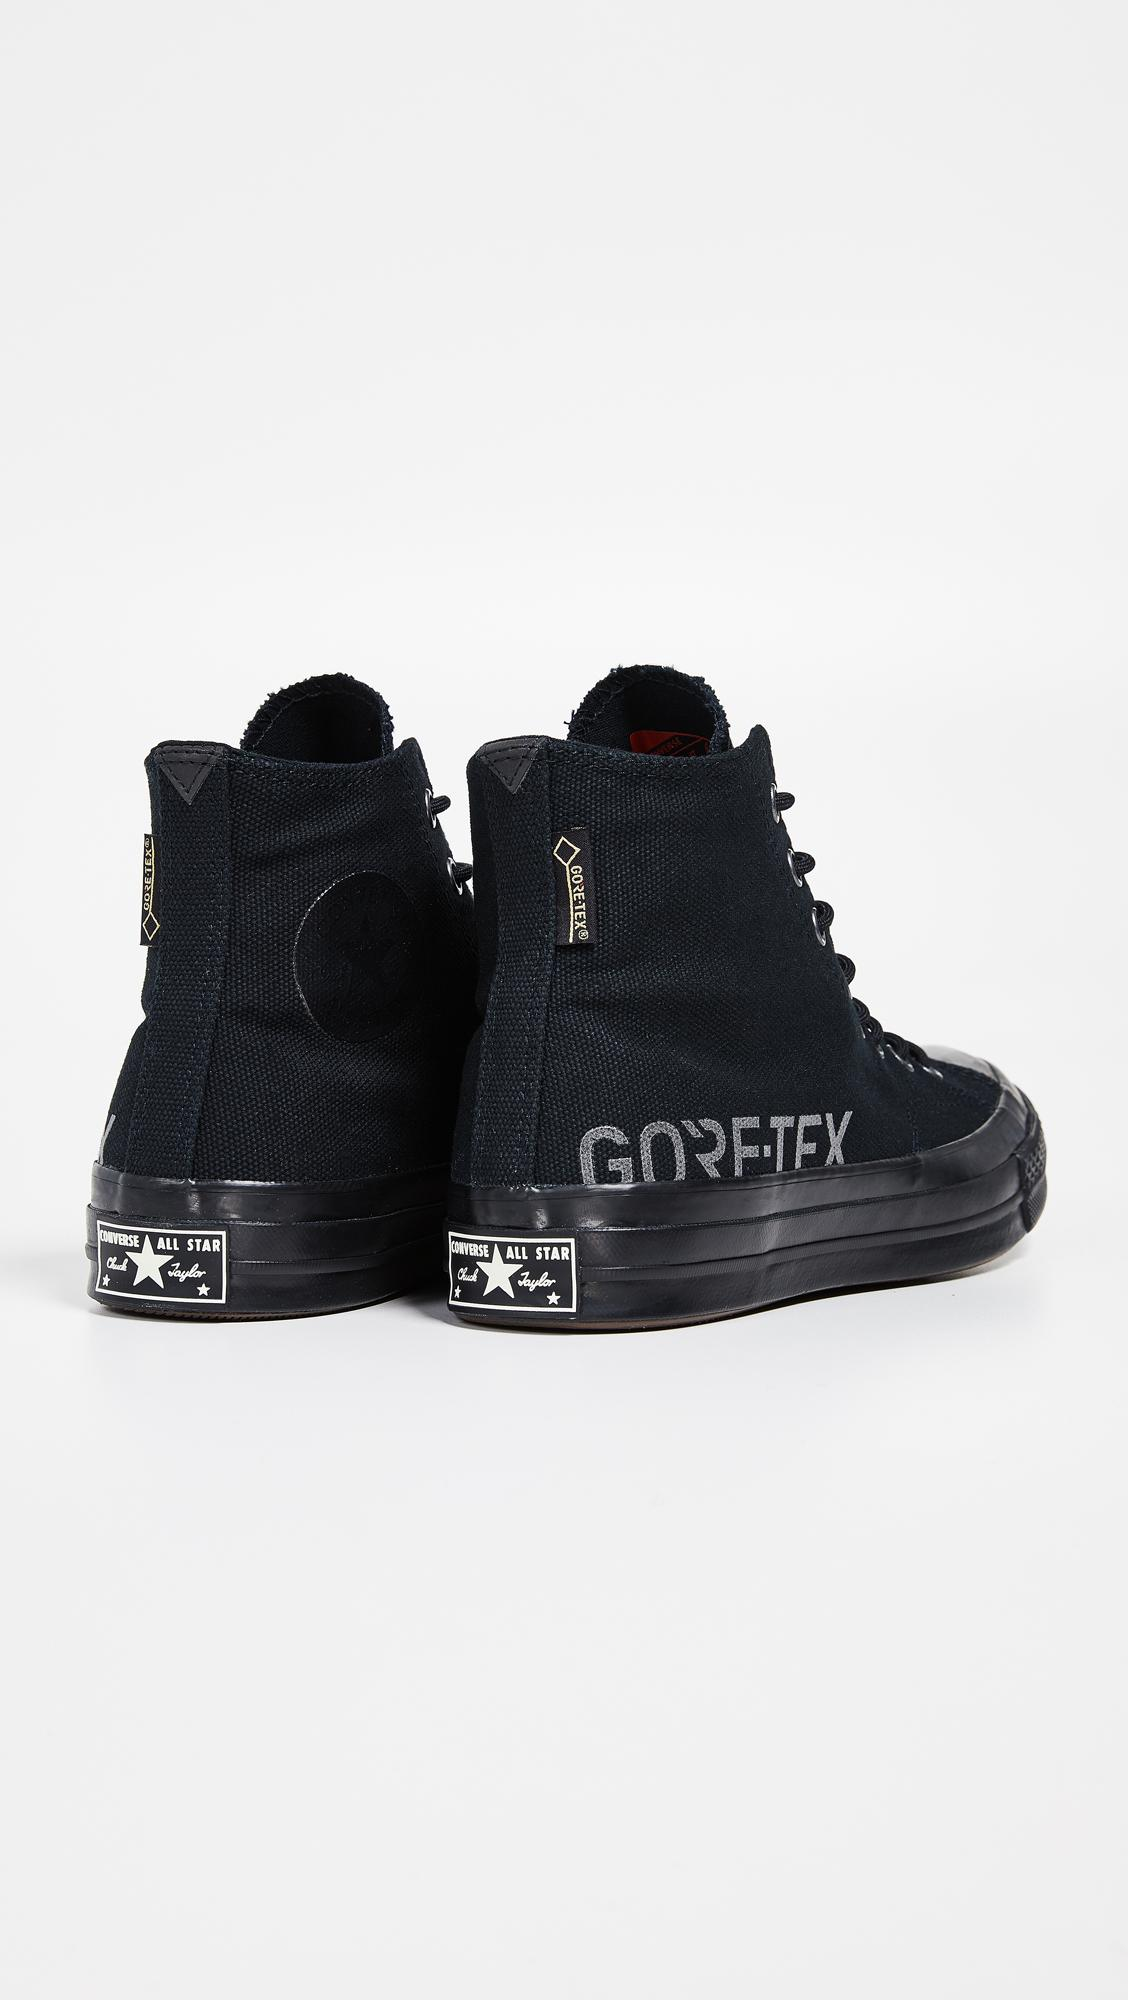 Lyst - Converse Chuck 70 Goretex Waterproof High Top Sneakers in ... c511df877